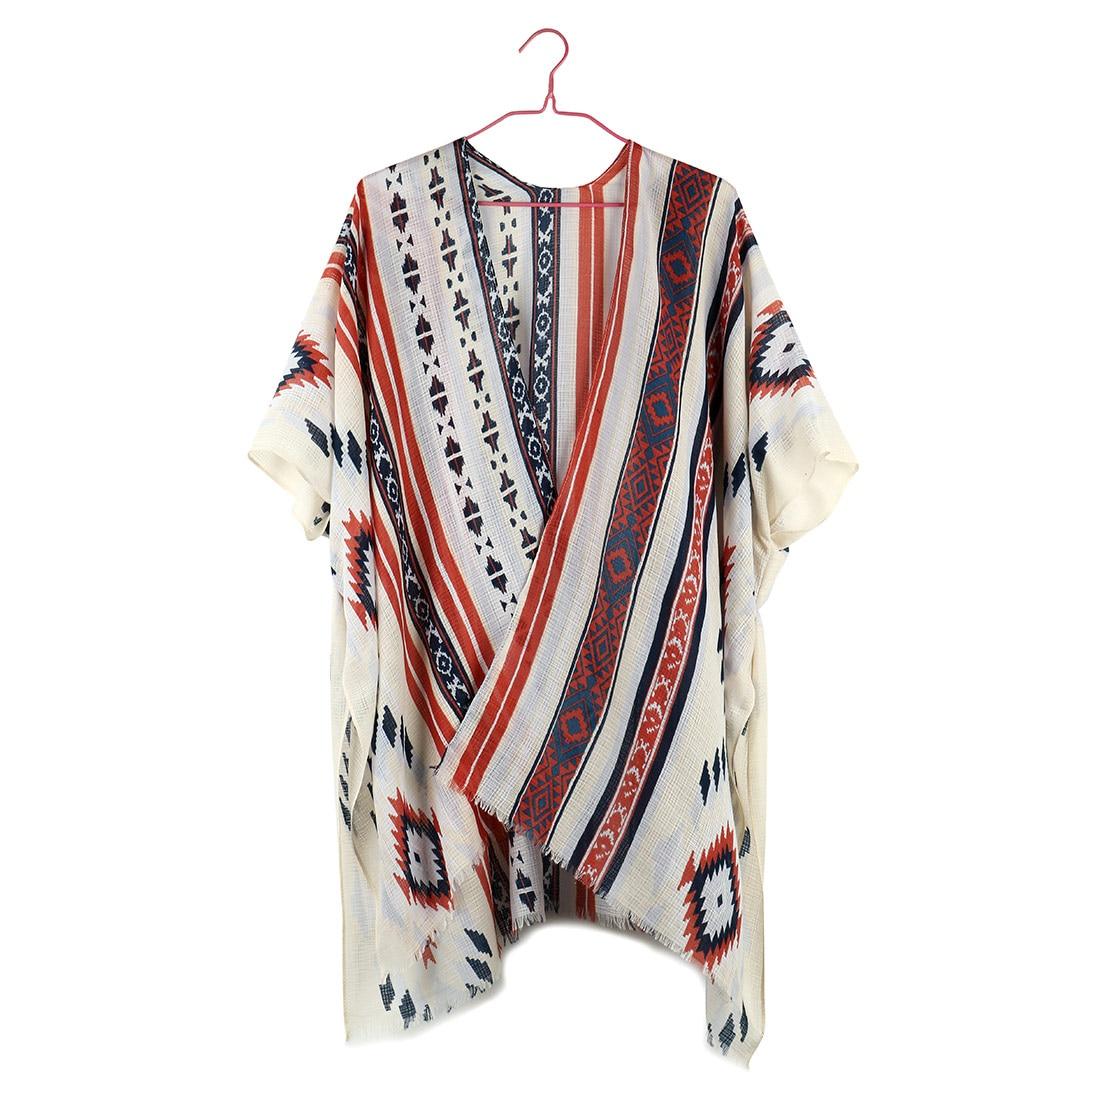 Nuevo Kimono Floral rayado Mujer Vintage Boho blusa Top Kimono Mujer camisa 2019 blusa femenina verano playa Rebeca larga